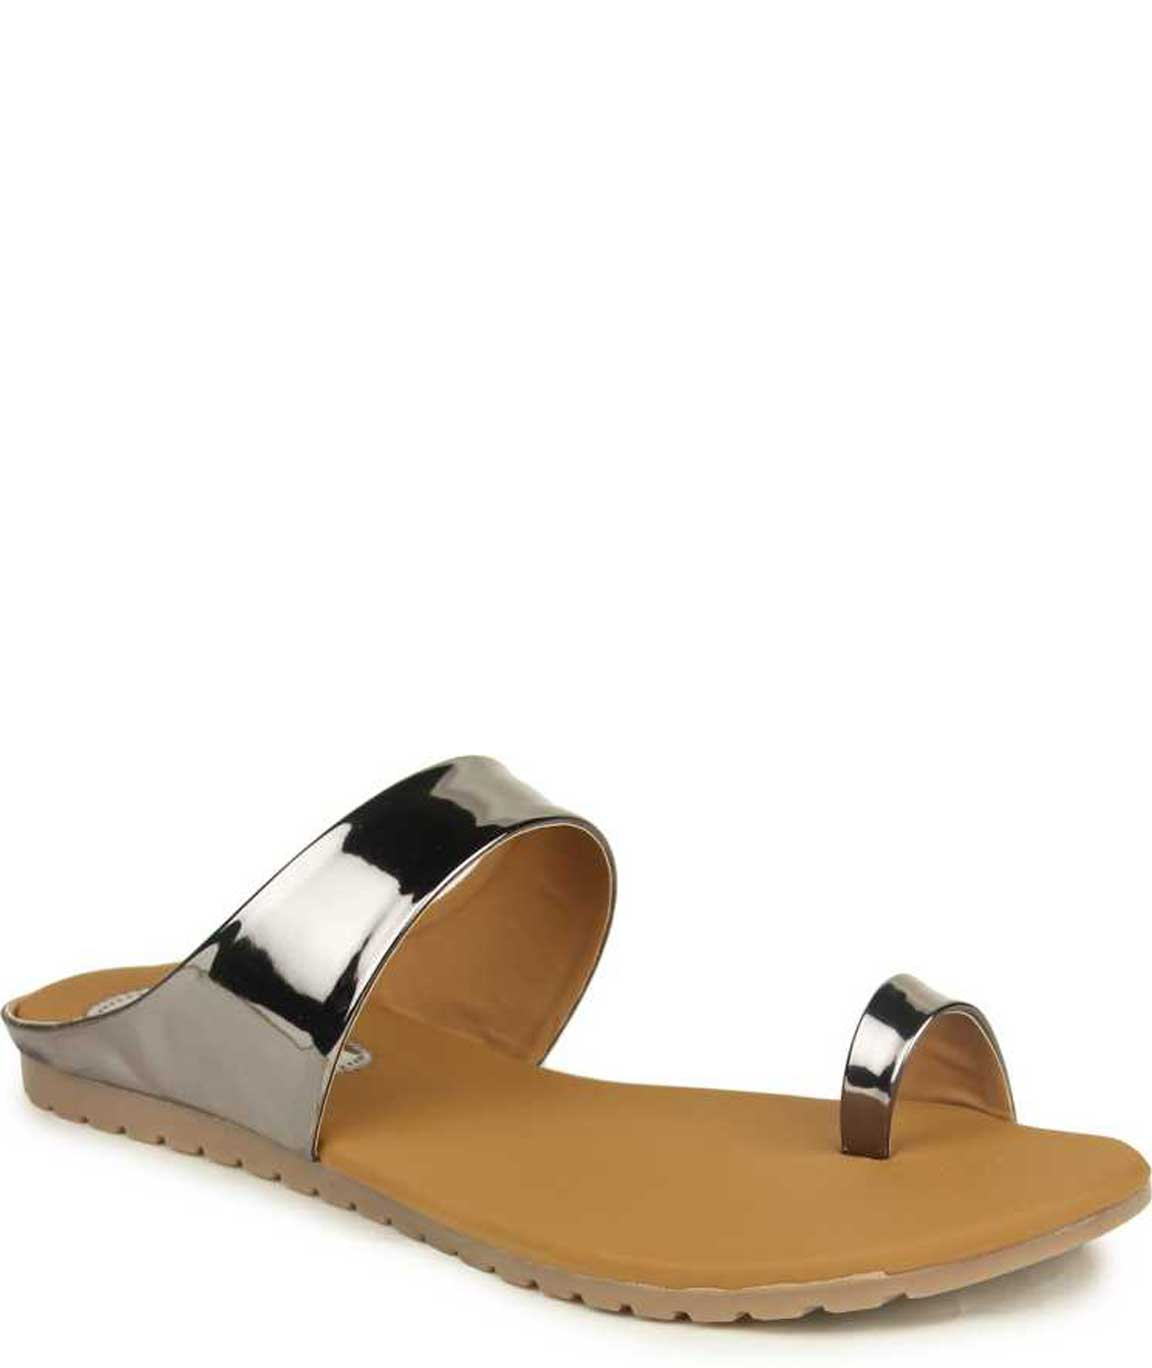 WOMEN GREY SLIP-ON FLATS